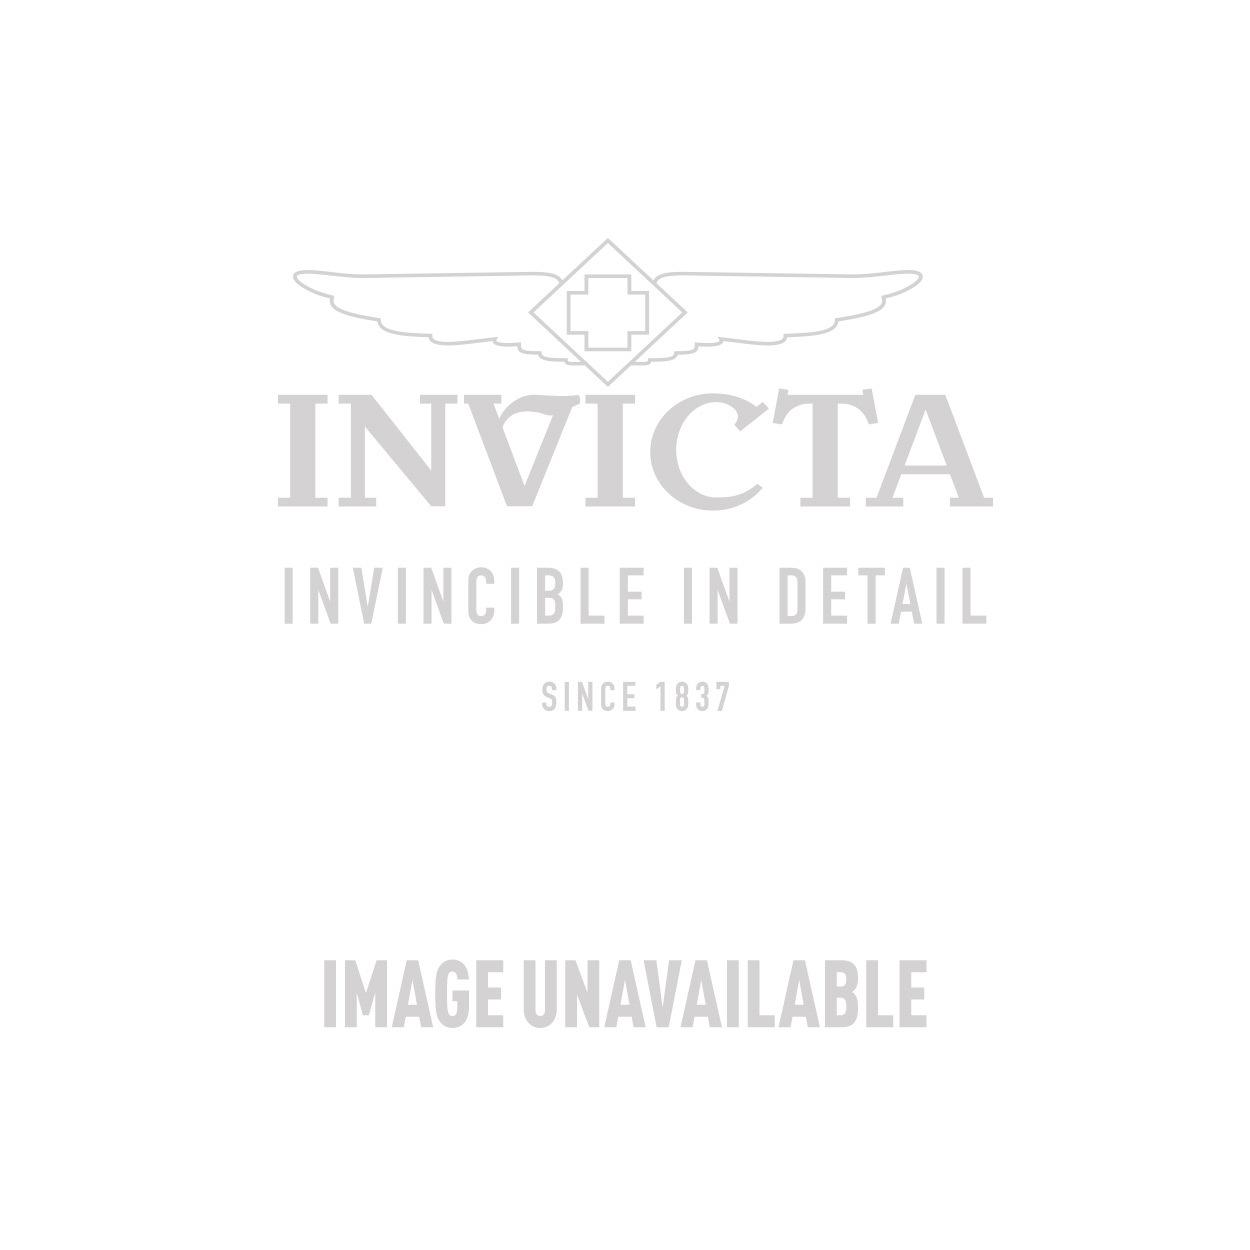 Invicta Lupah Women's Quartz 29mm Gold Case White Dial - Model 13834